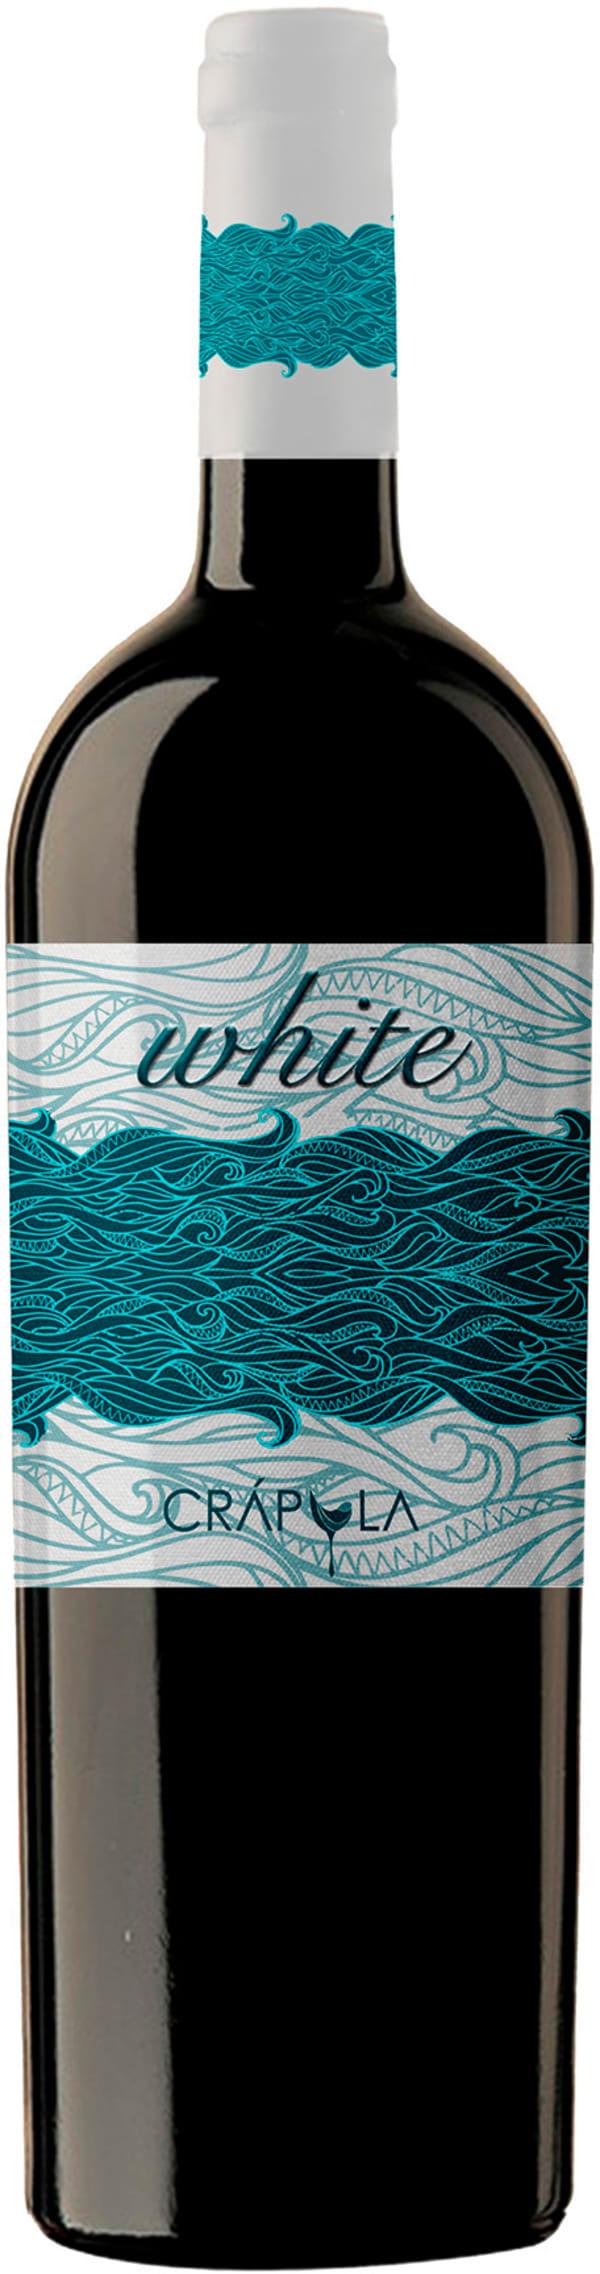 Crápula White Sauvignon Blanc 2017